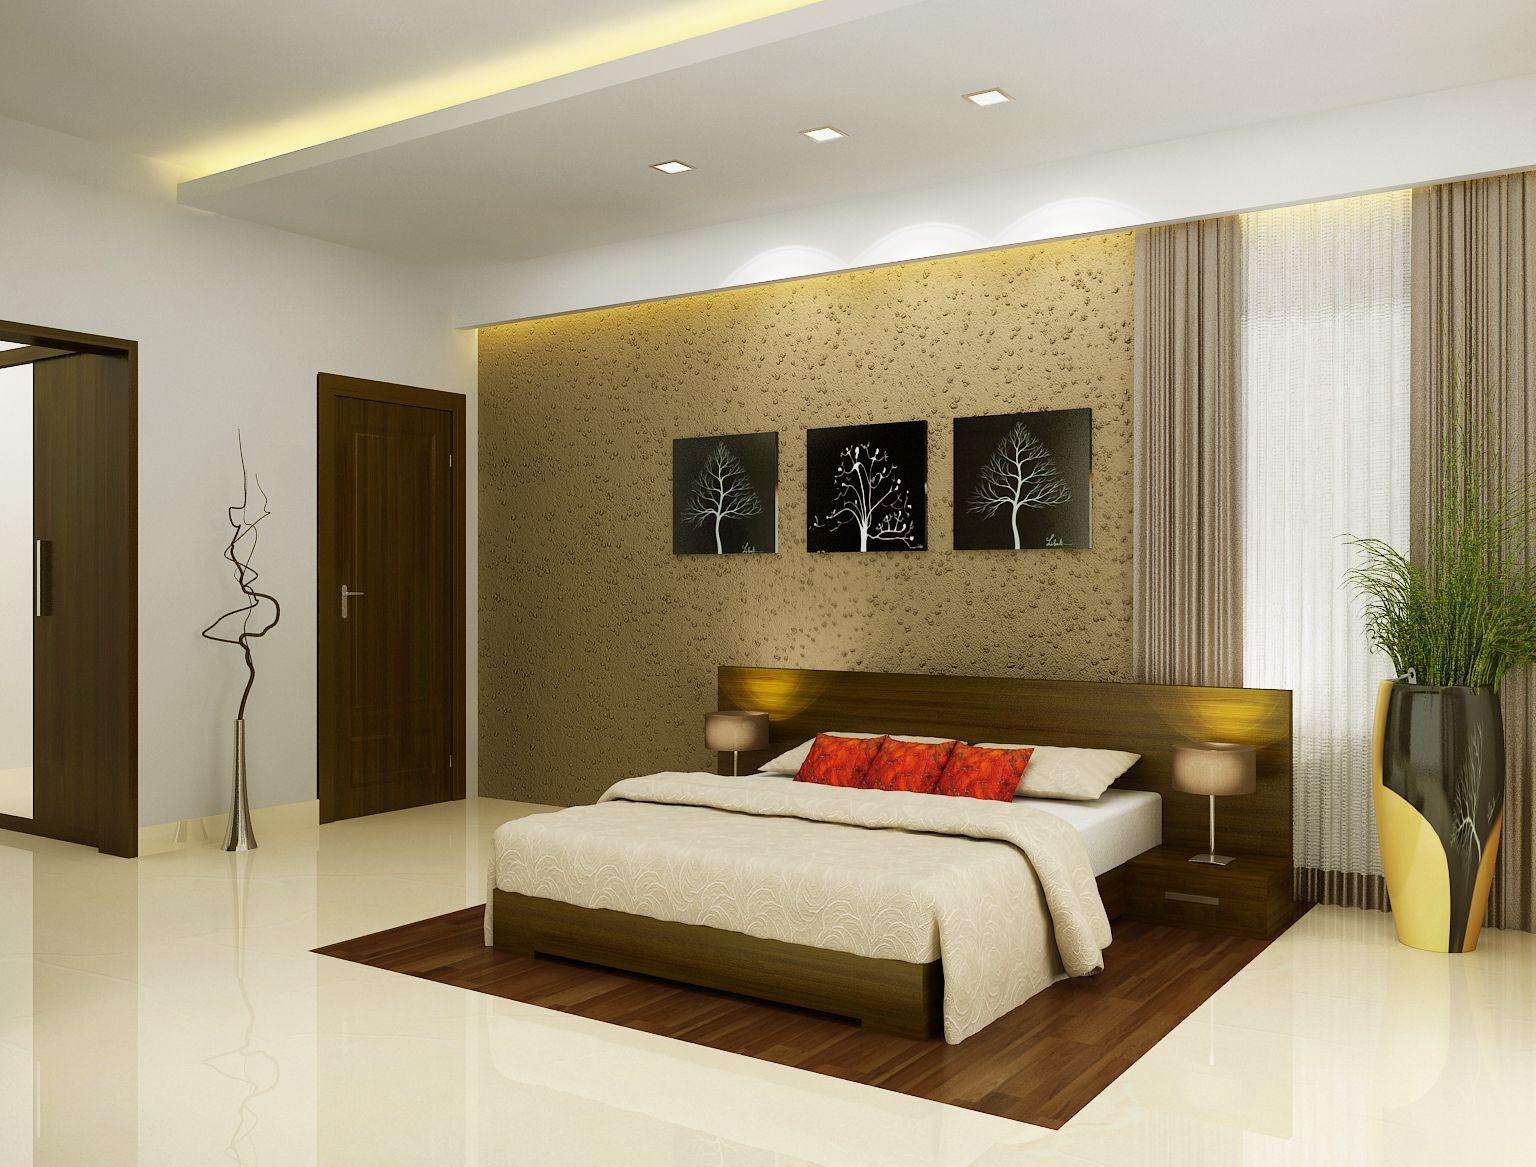 D'life home interiors ernakulam kerala adfbccbabdeecg   ideas  pinterest